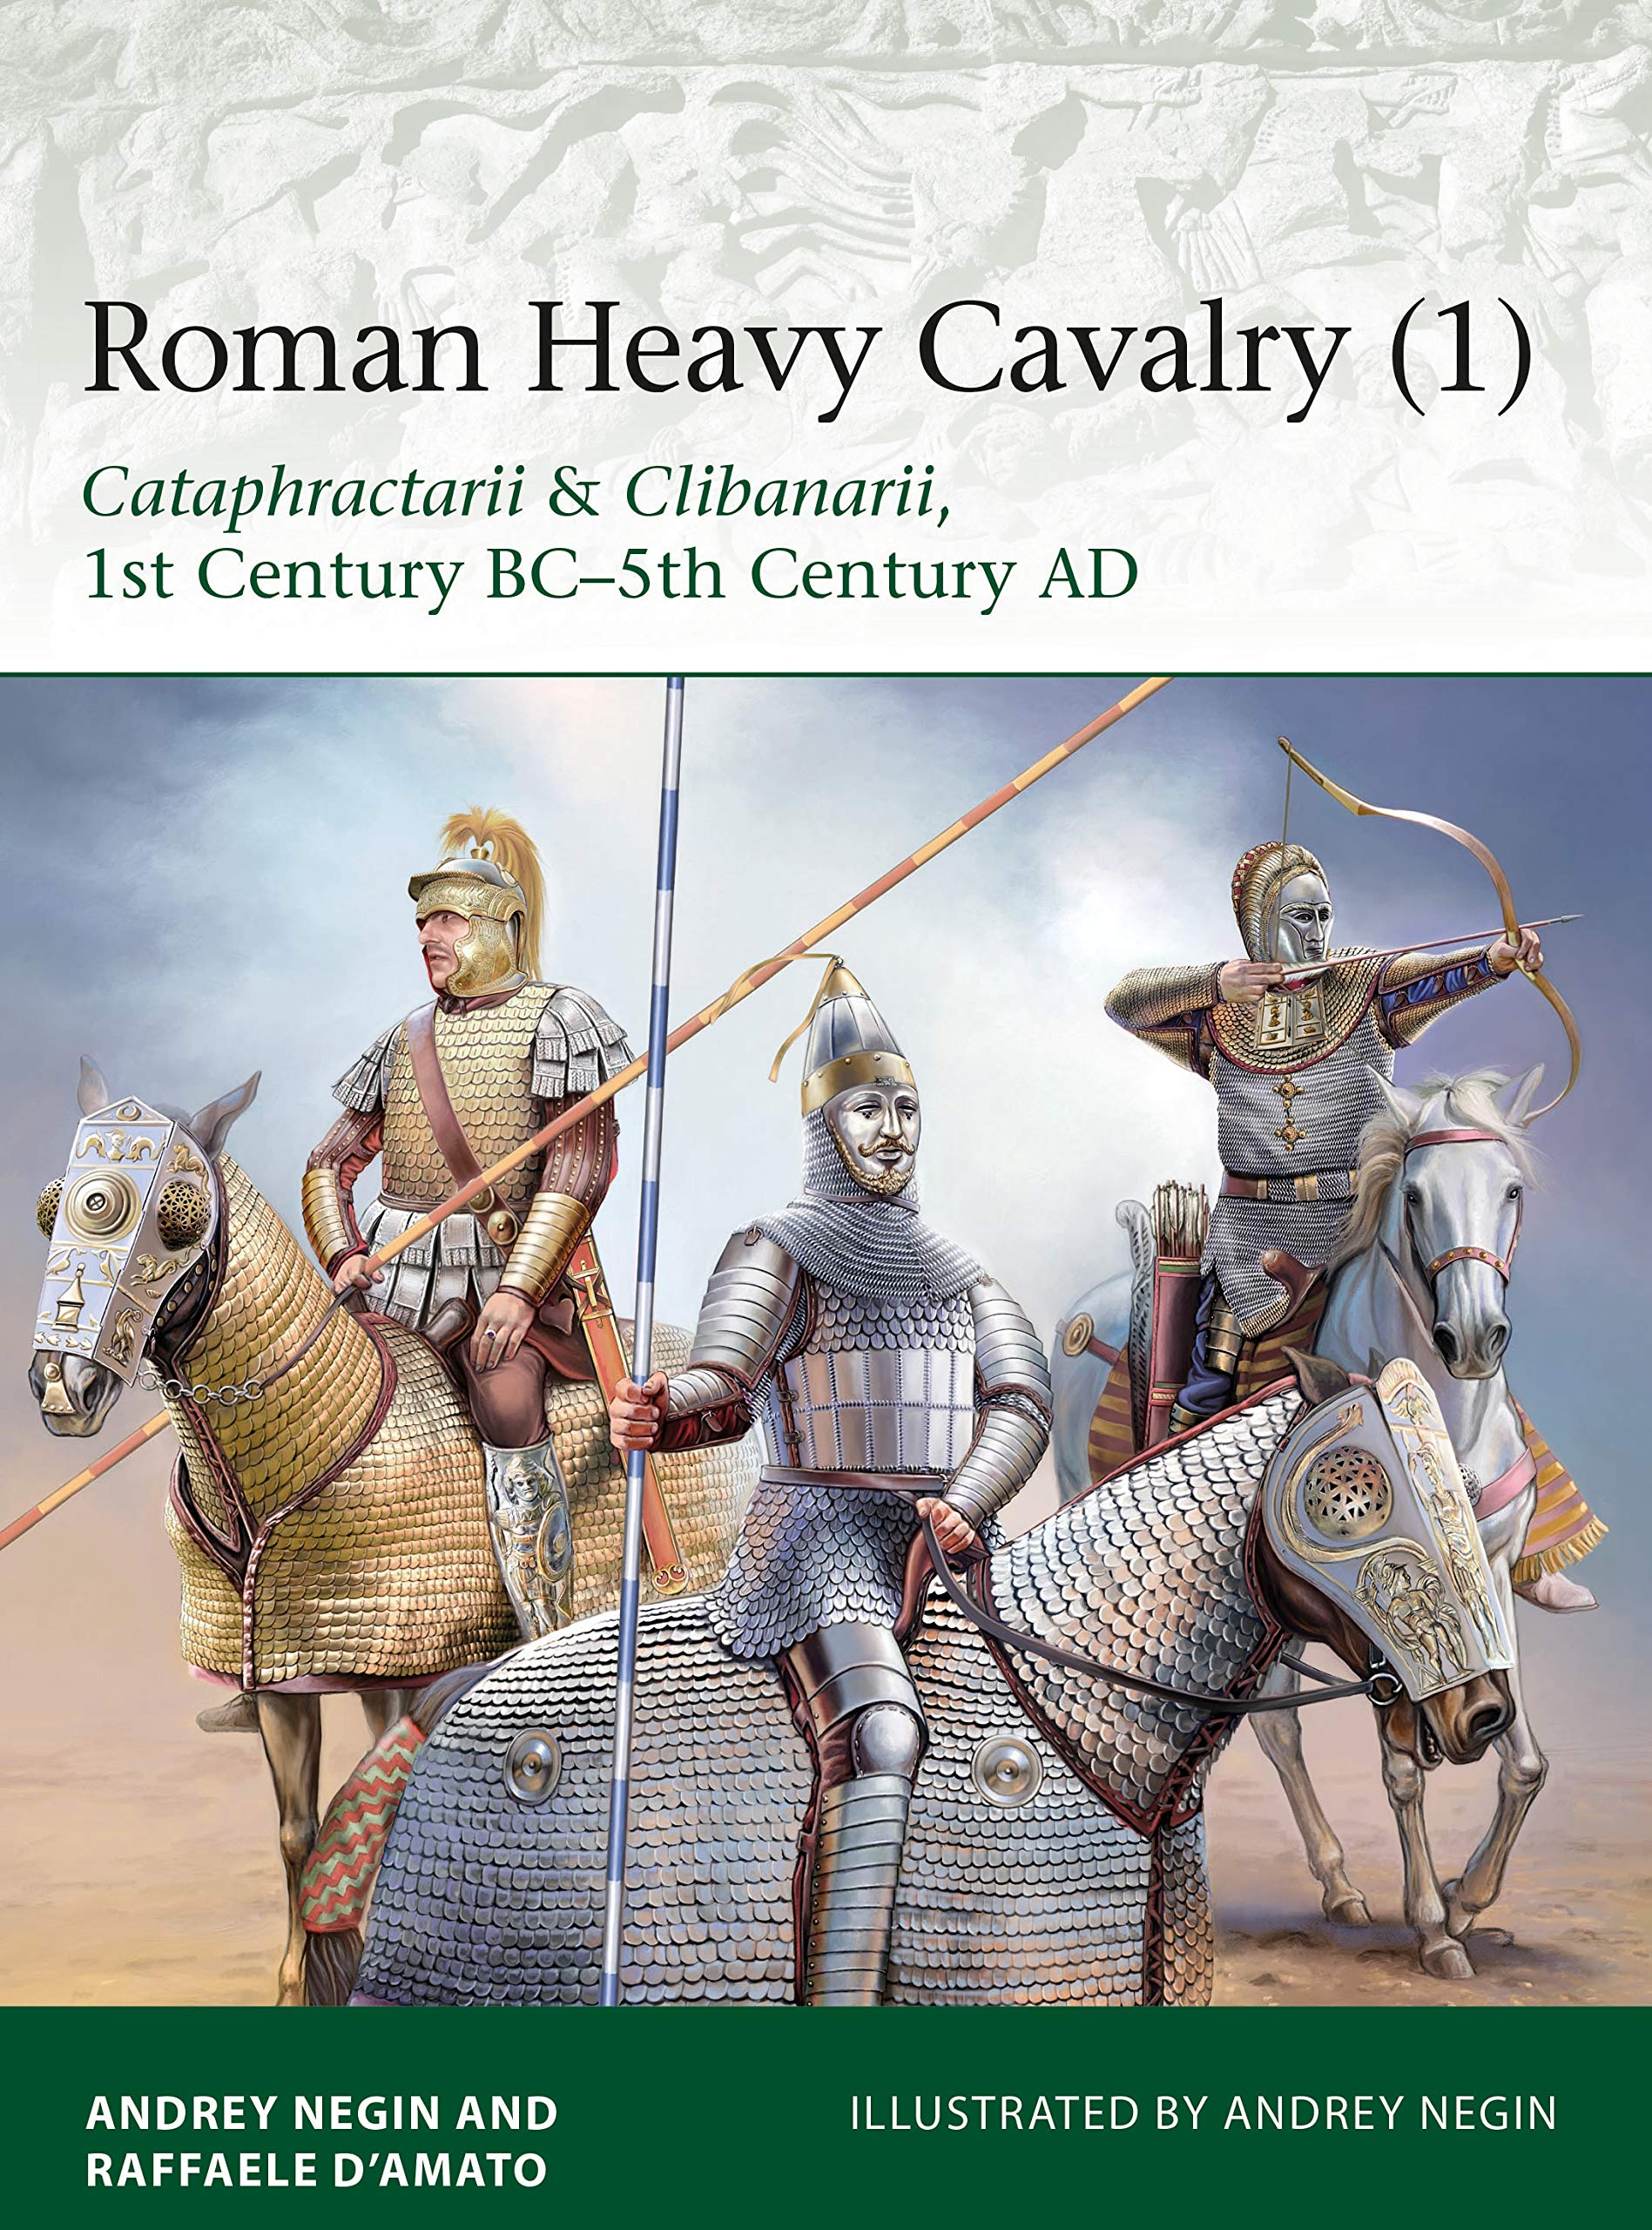 Roman Heavy Cavalry 1 Cataphractarii Clibanarii 1st Century Bc